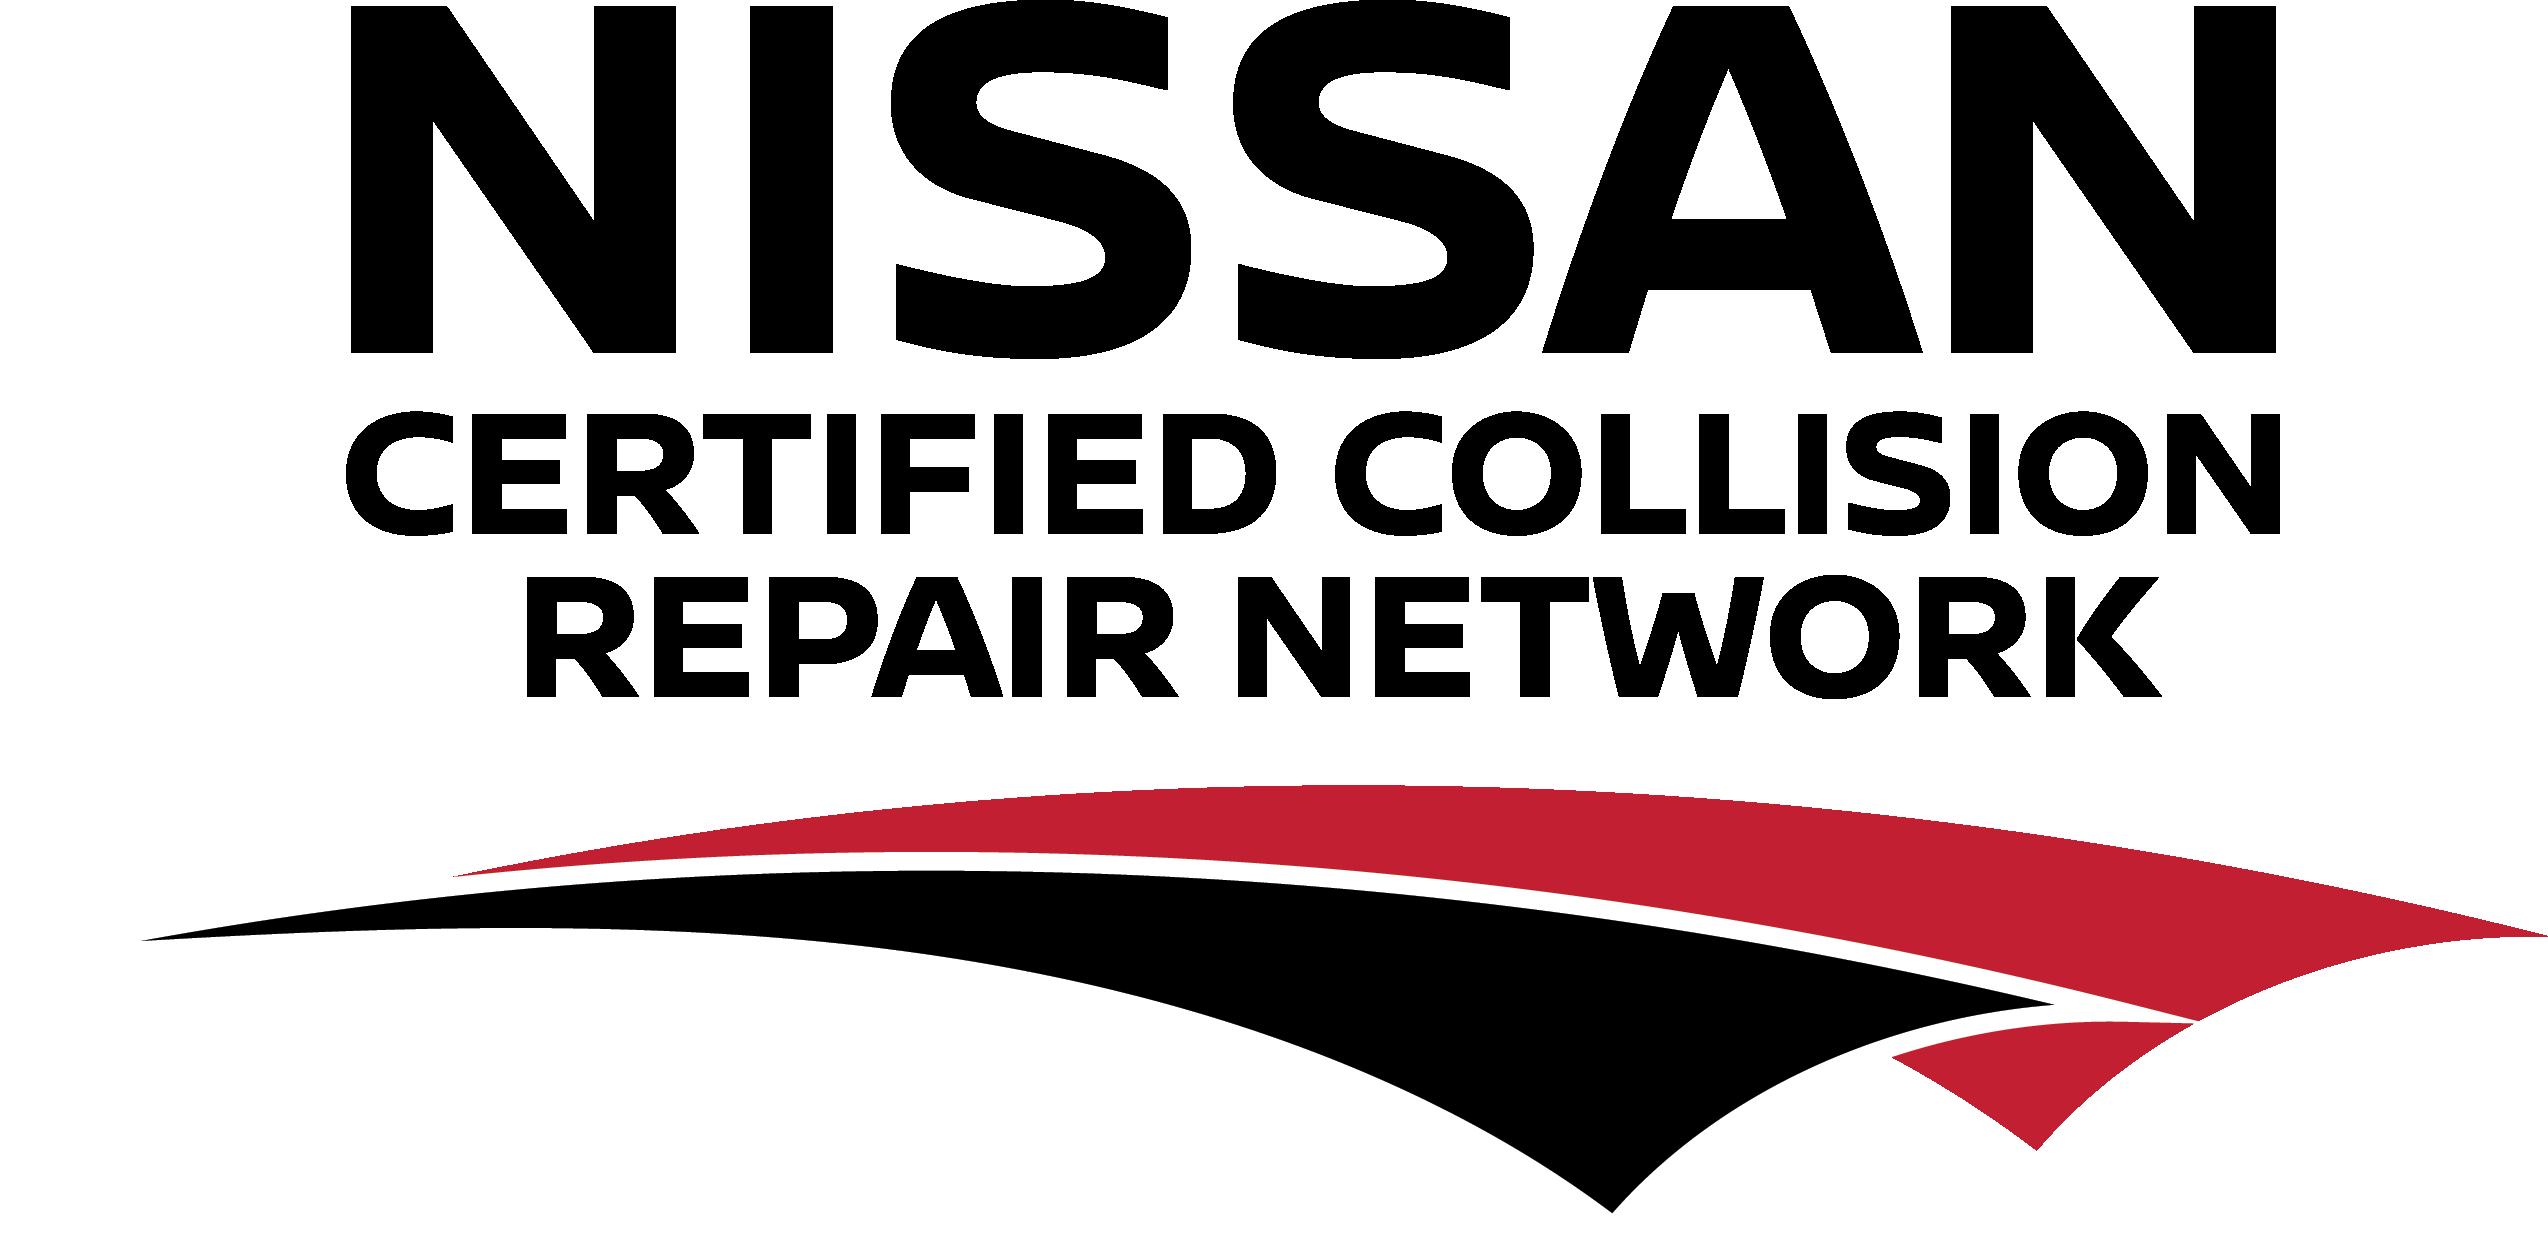 https://secureservercdn.net/192.169.223.13/hm3.7eb.myftpupload.com/wp-content/uploads/2020/11/thumbnail_Nissan-CRN-Logo_BLK-1.png